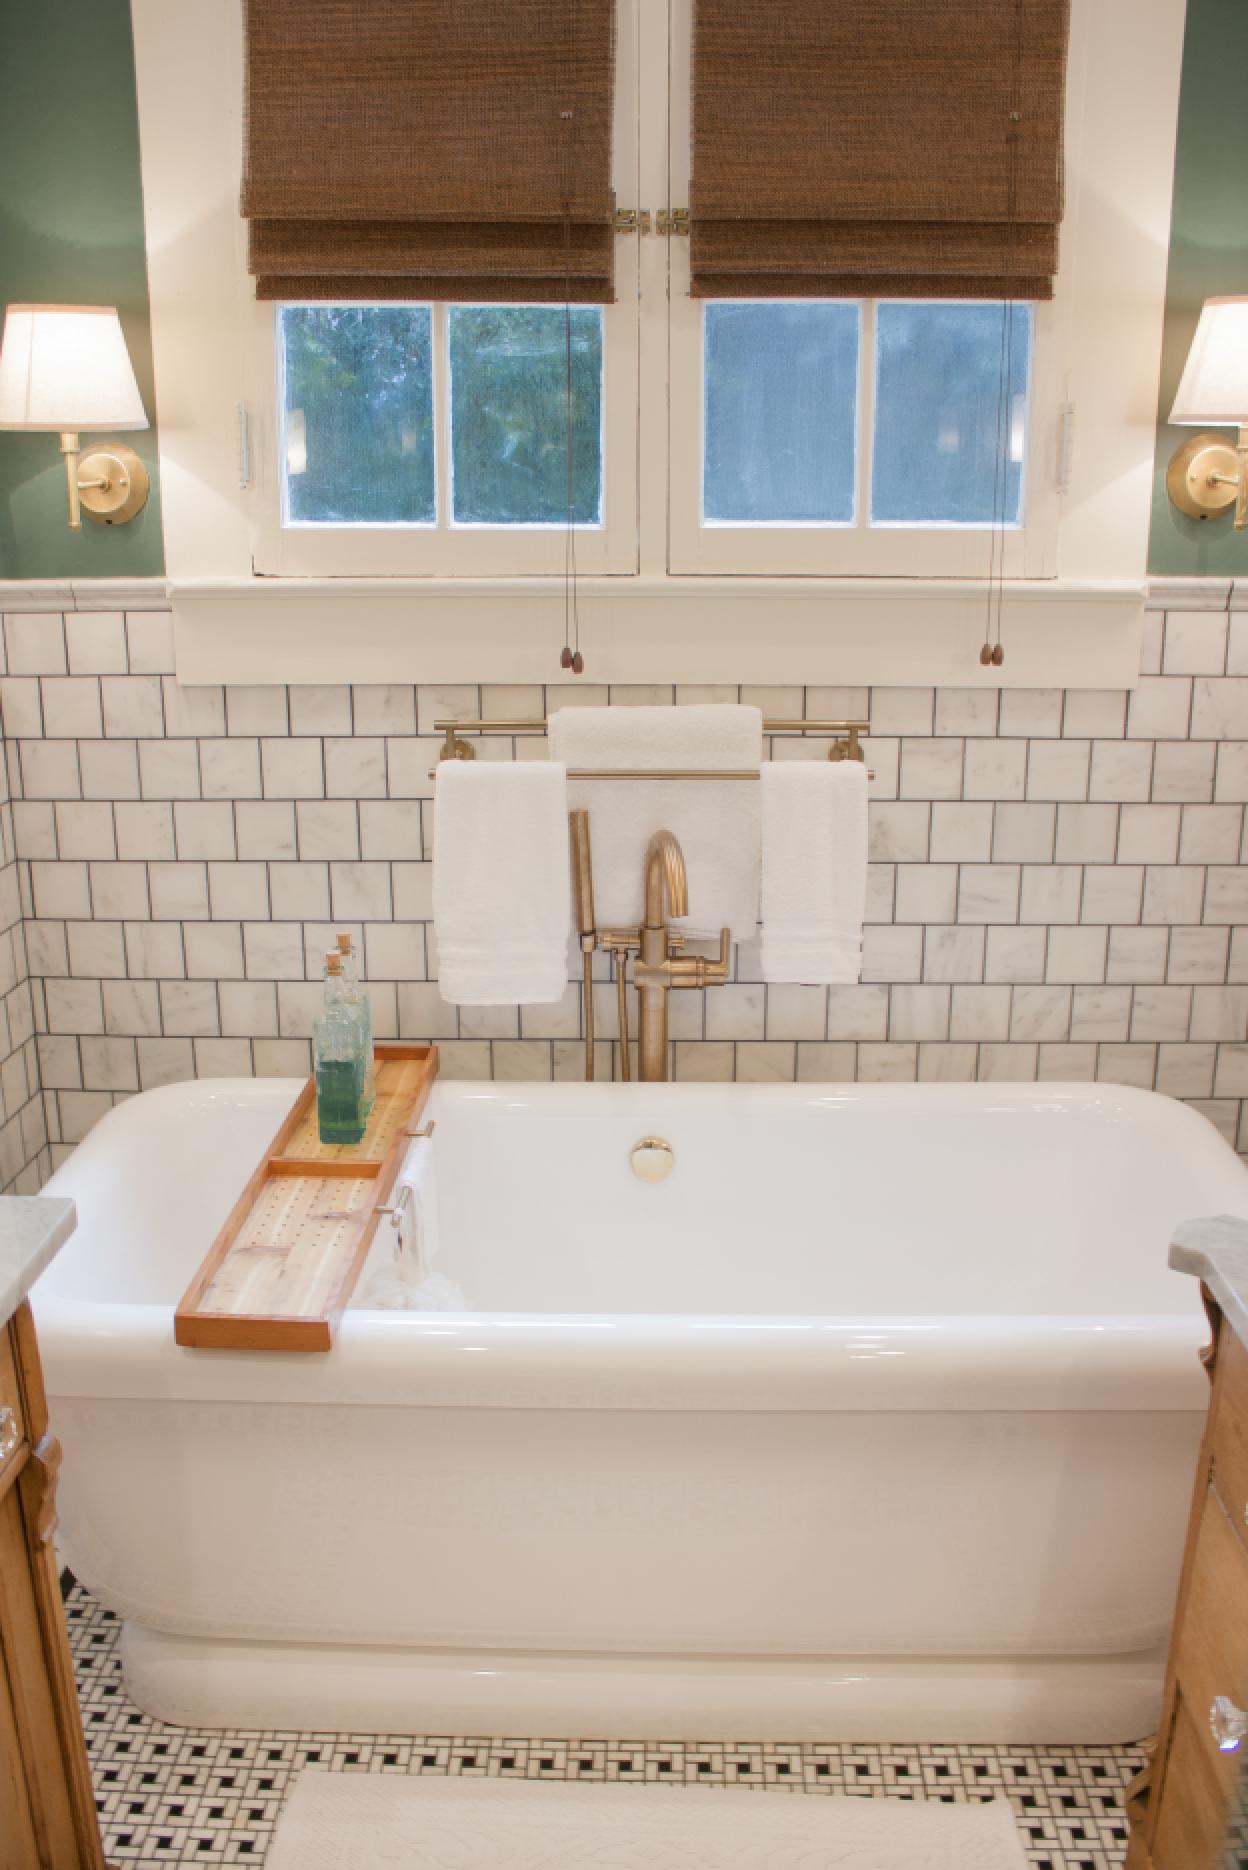 2,848 The New Bathroom. – Laurel Mercantile Co.